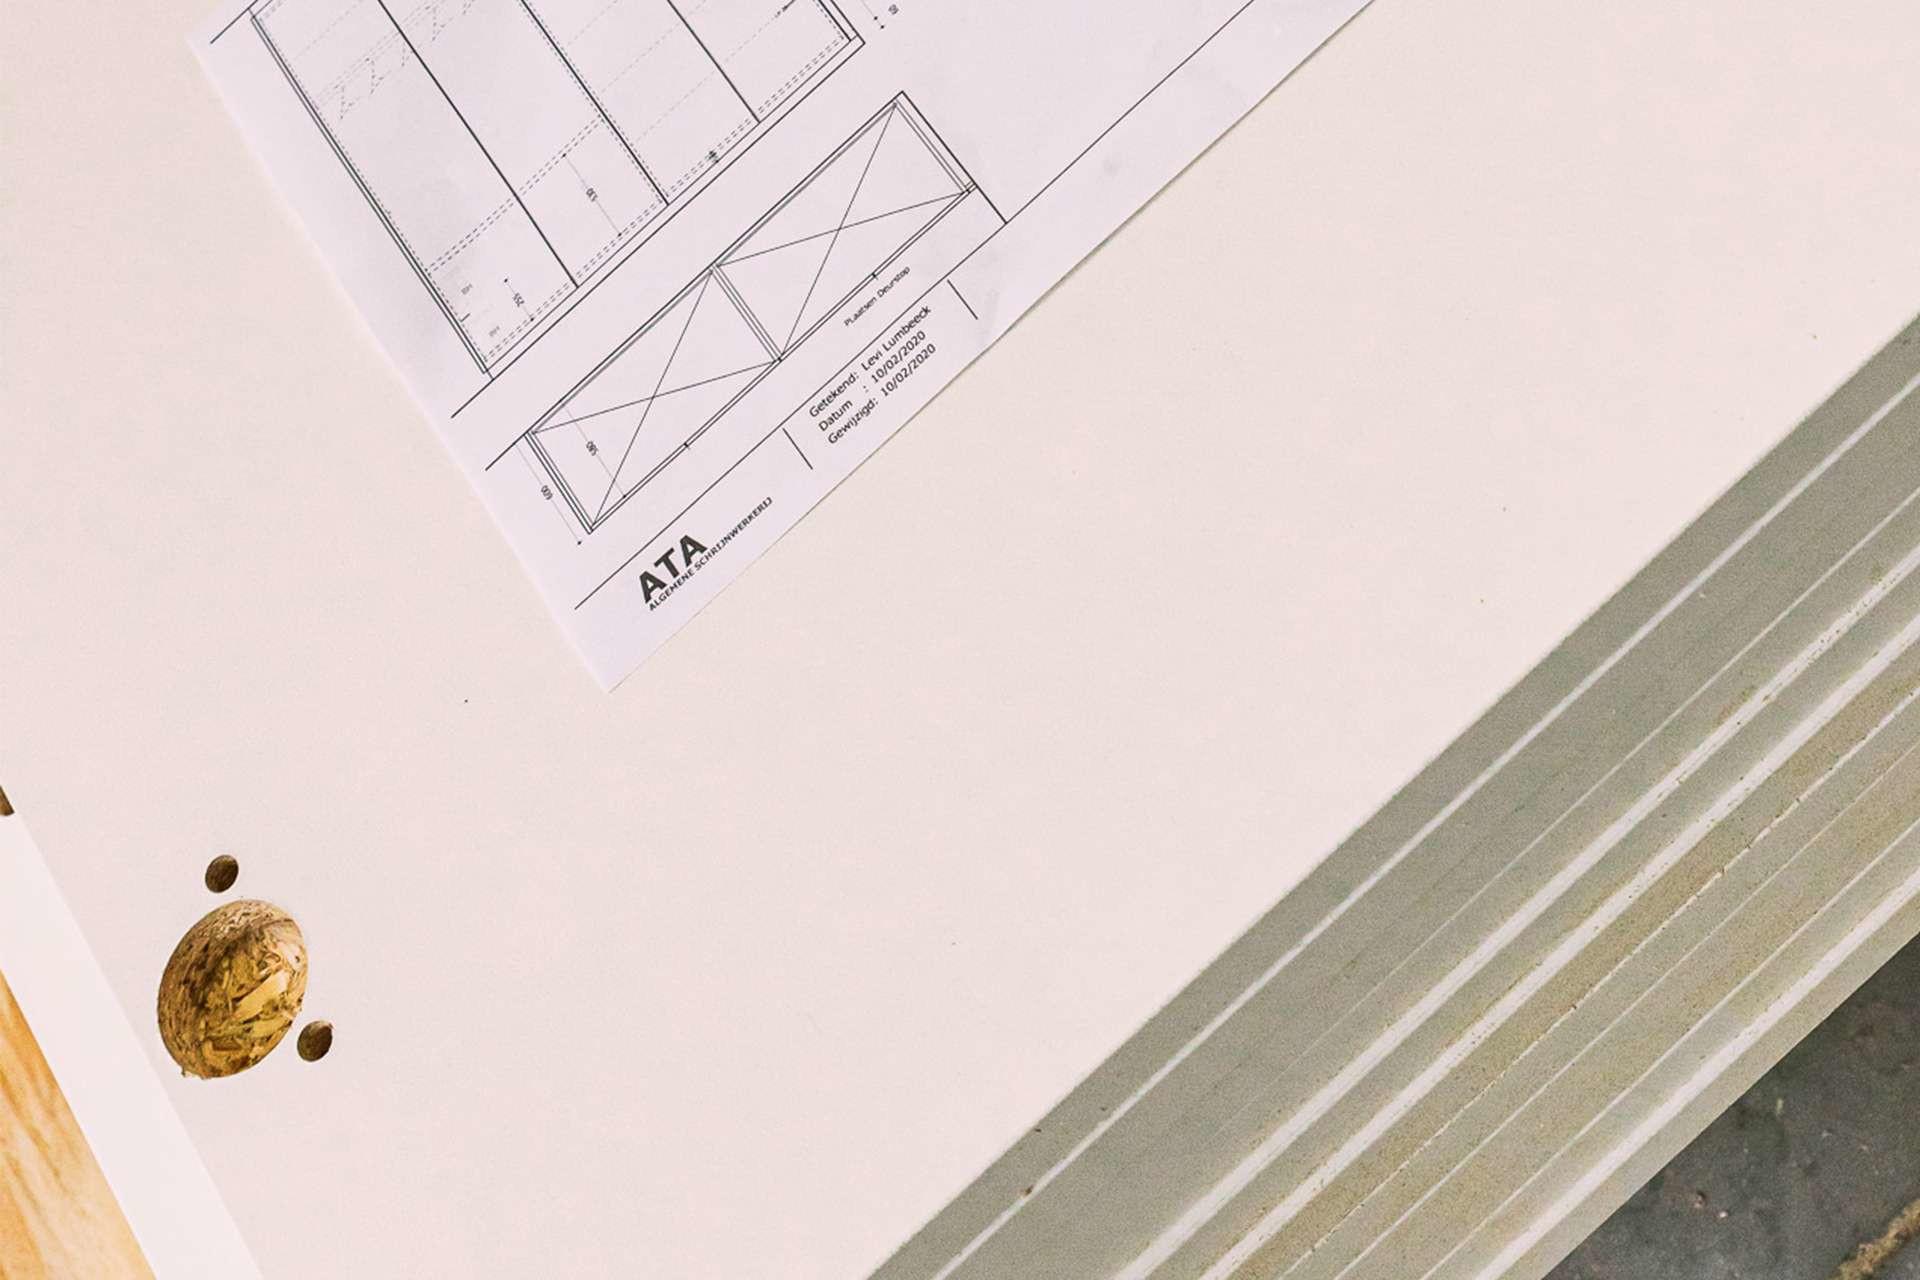 ATA Interieur - Productie - Constructieboringen en plan